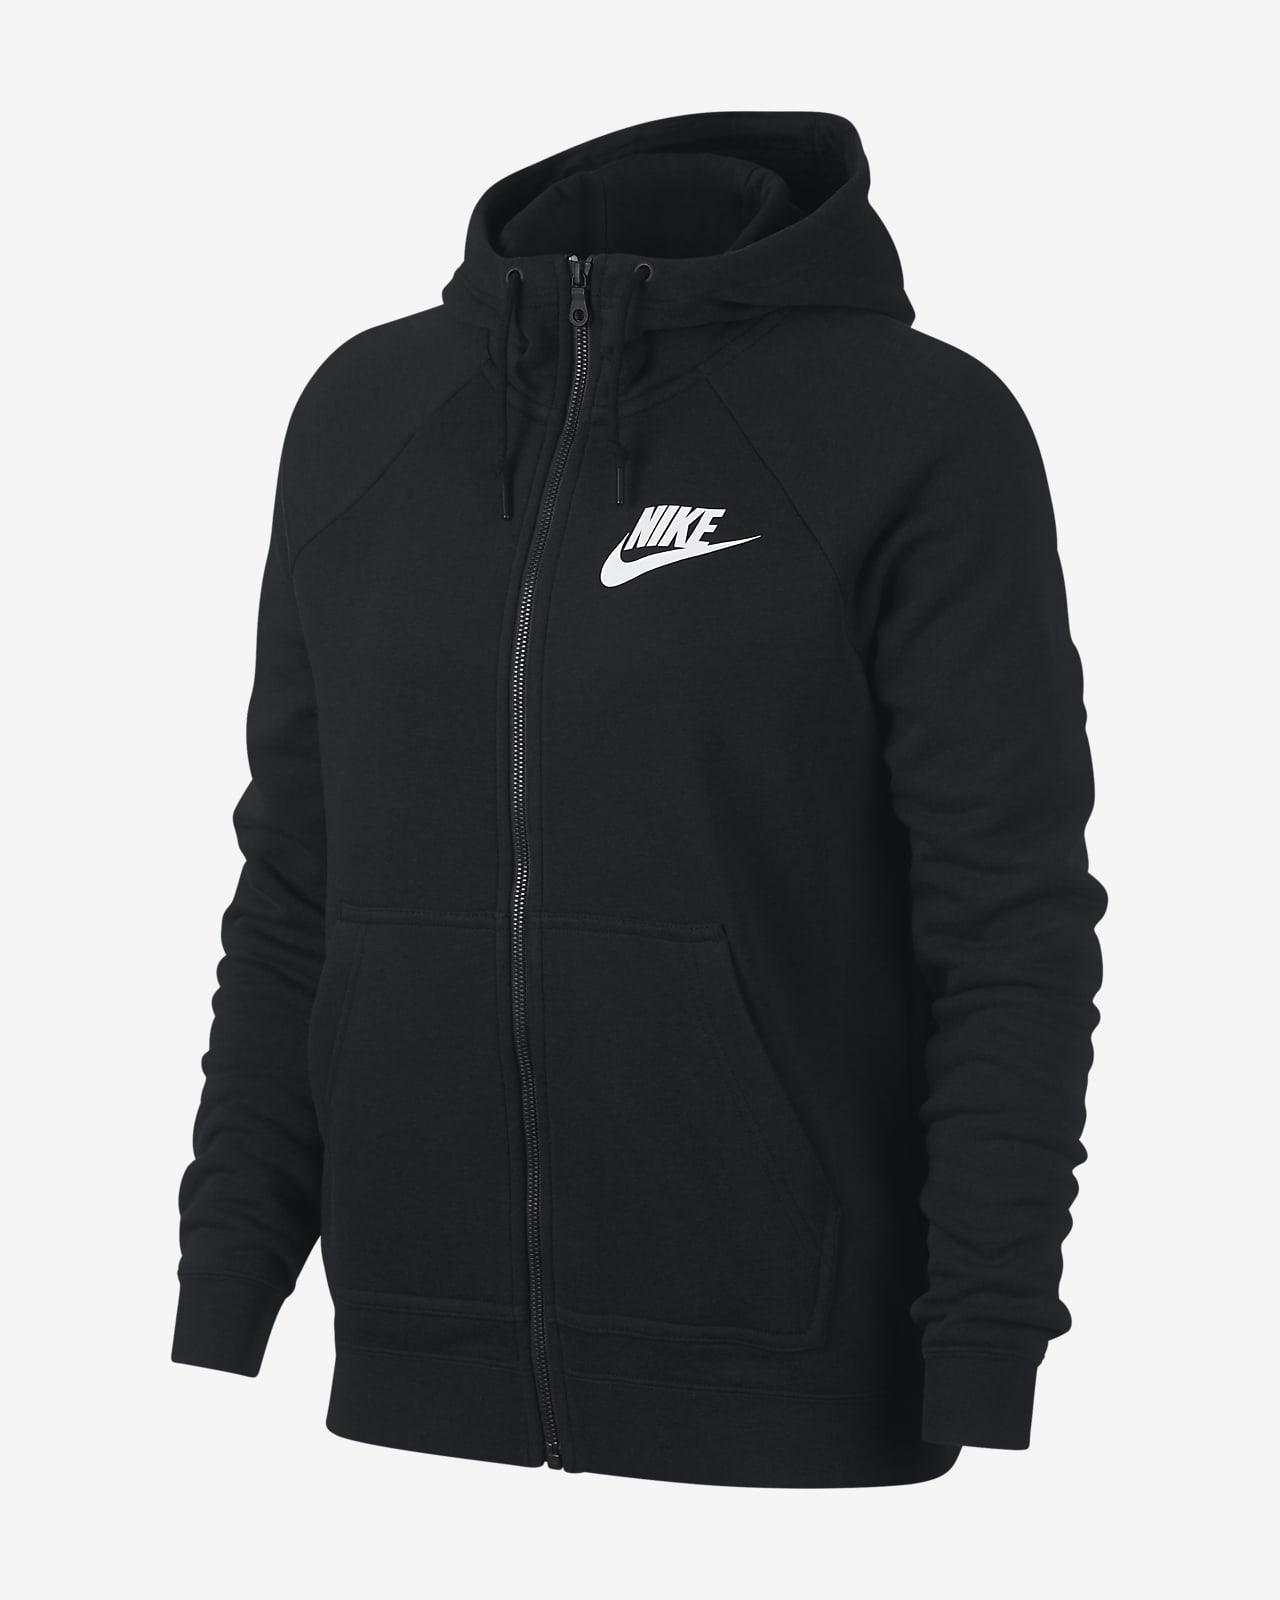 Nike Sportswear Rally 女子全长拉链开襟连帽衫